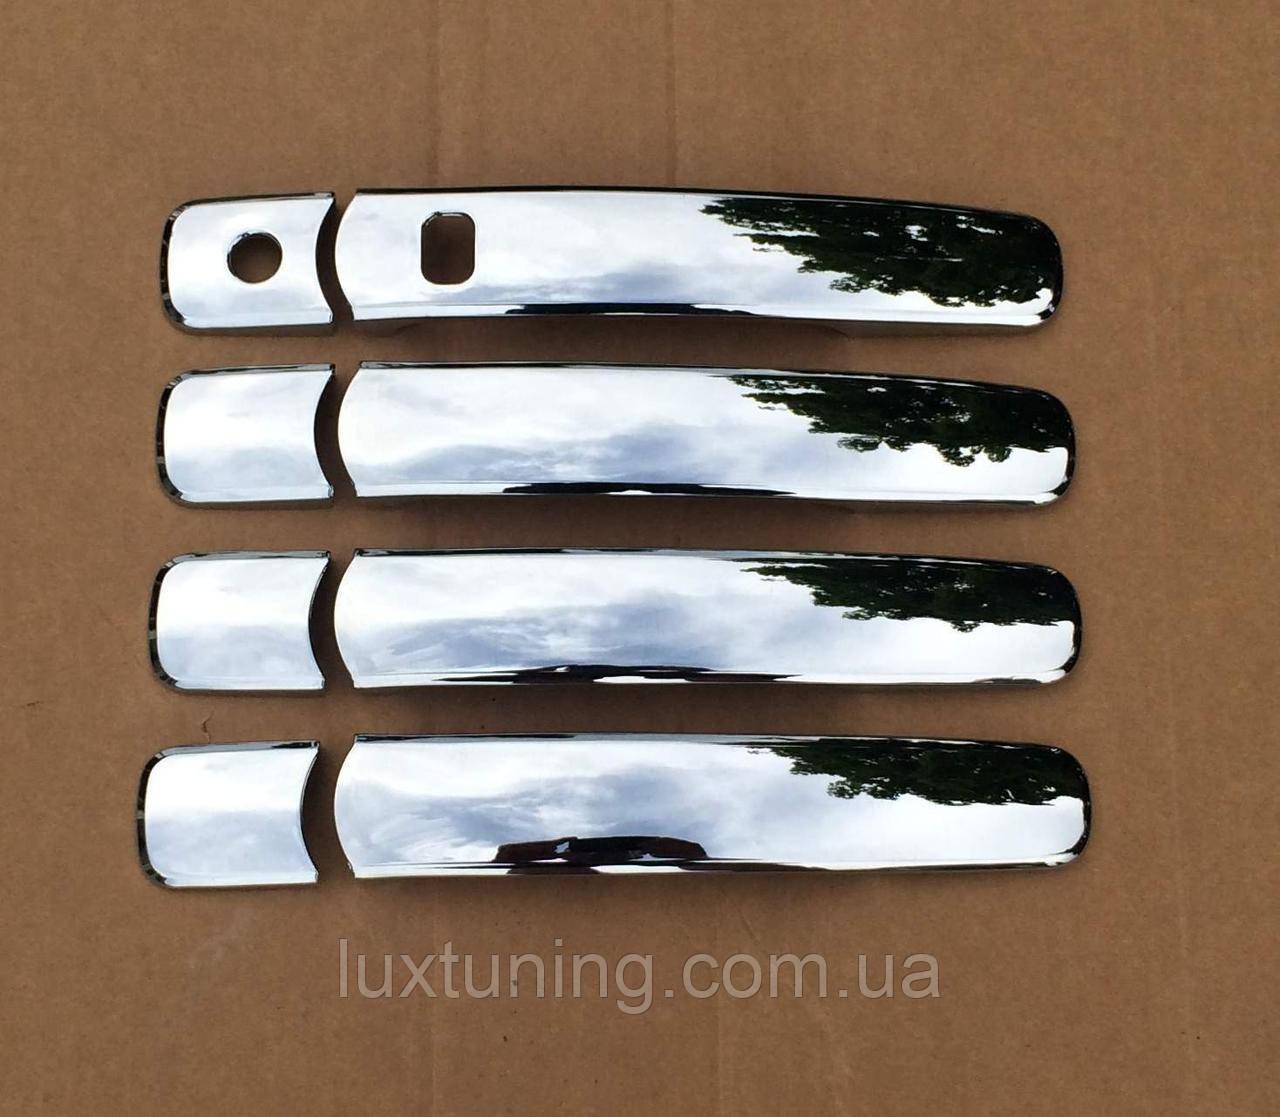 "Накладки на ручки Nissan X-Trail T31 2007-2013 под чип (электронный ключ) - магазин ""Luxtuning"" в Днепре"